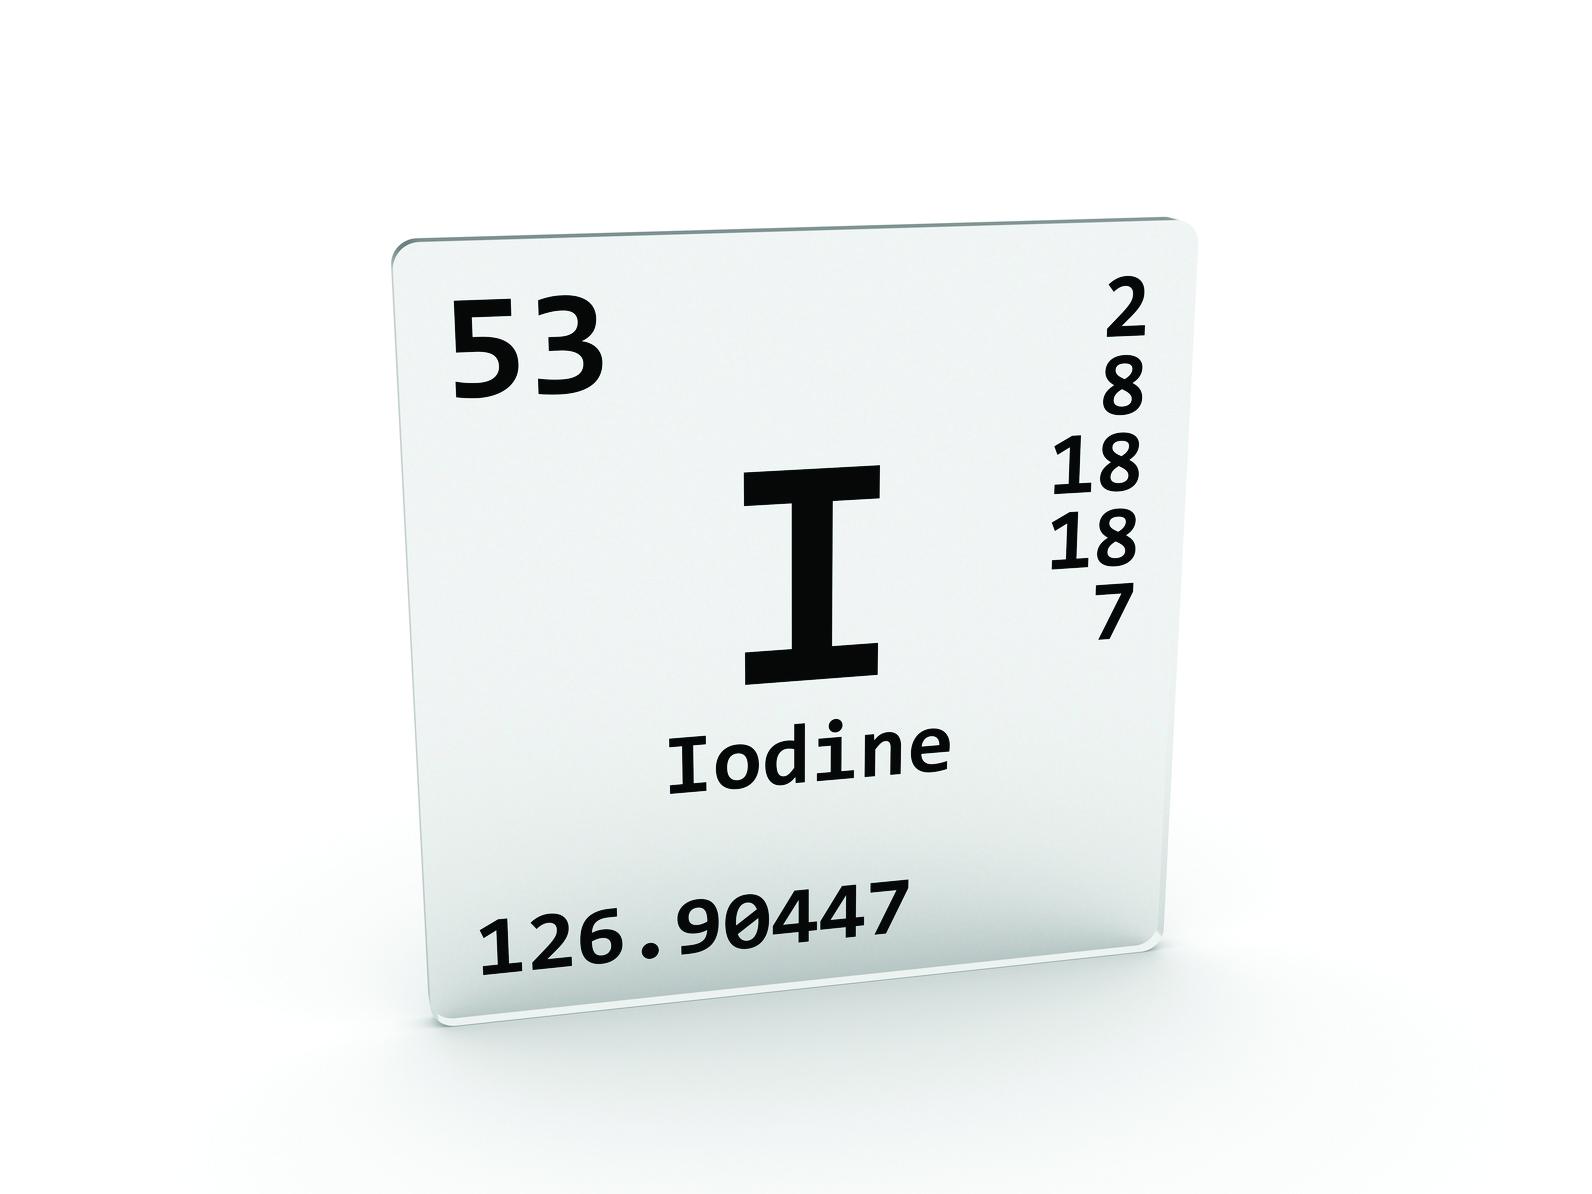 Iodine symbol - I - element of the periodic table